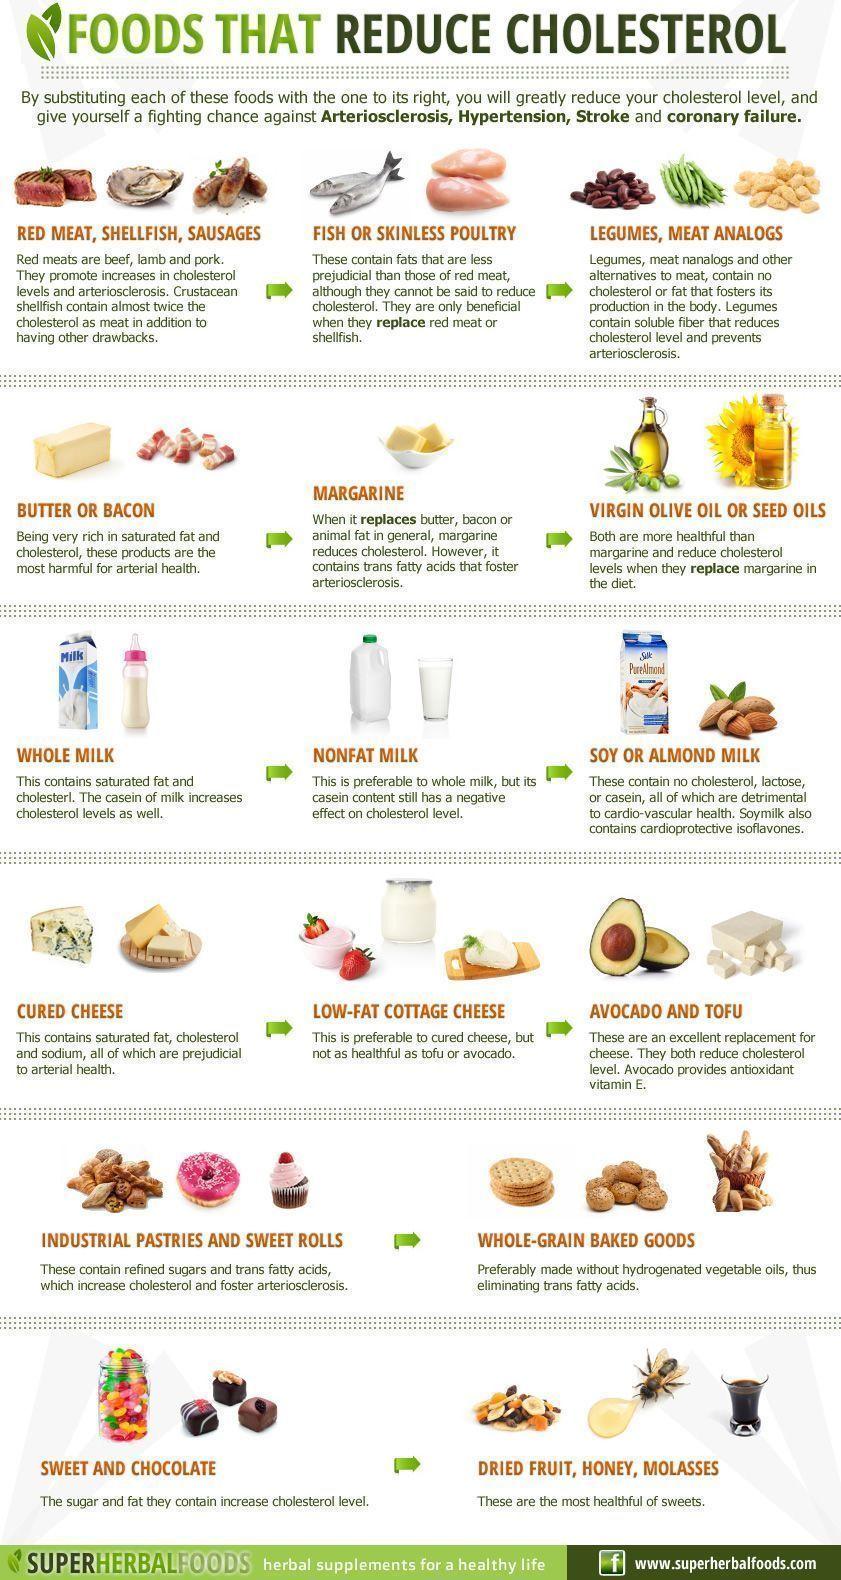 Fat loss workout twice a day